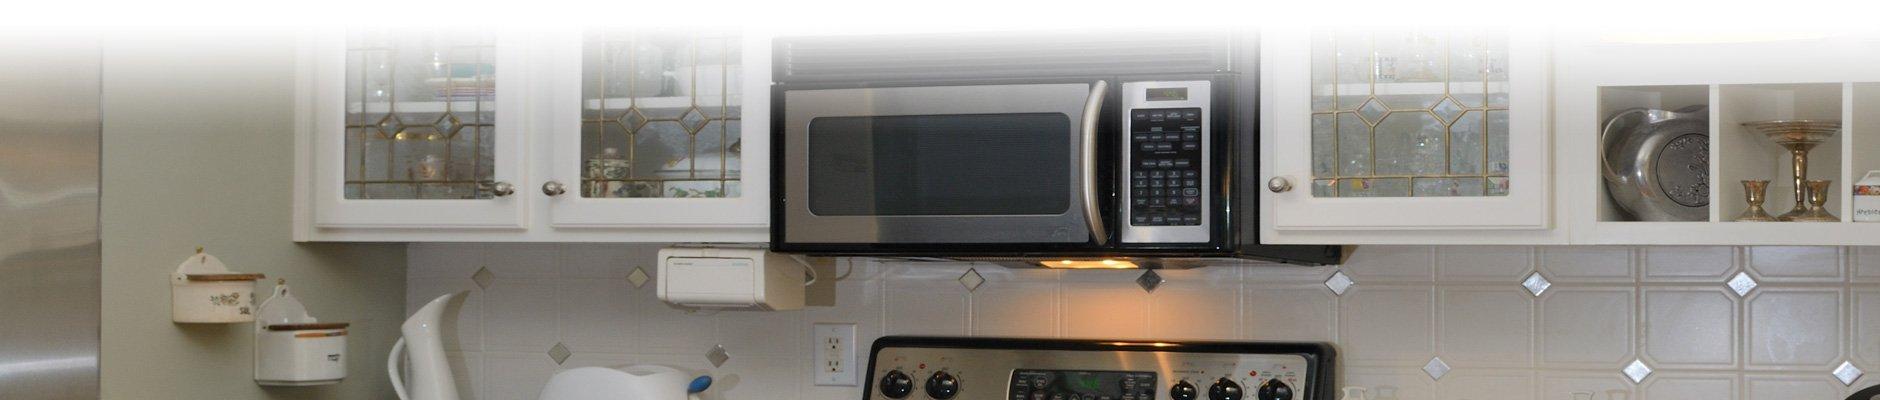 Amazon.com: Instalación de horno de microondas